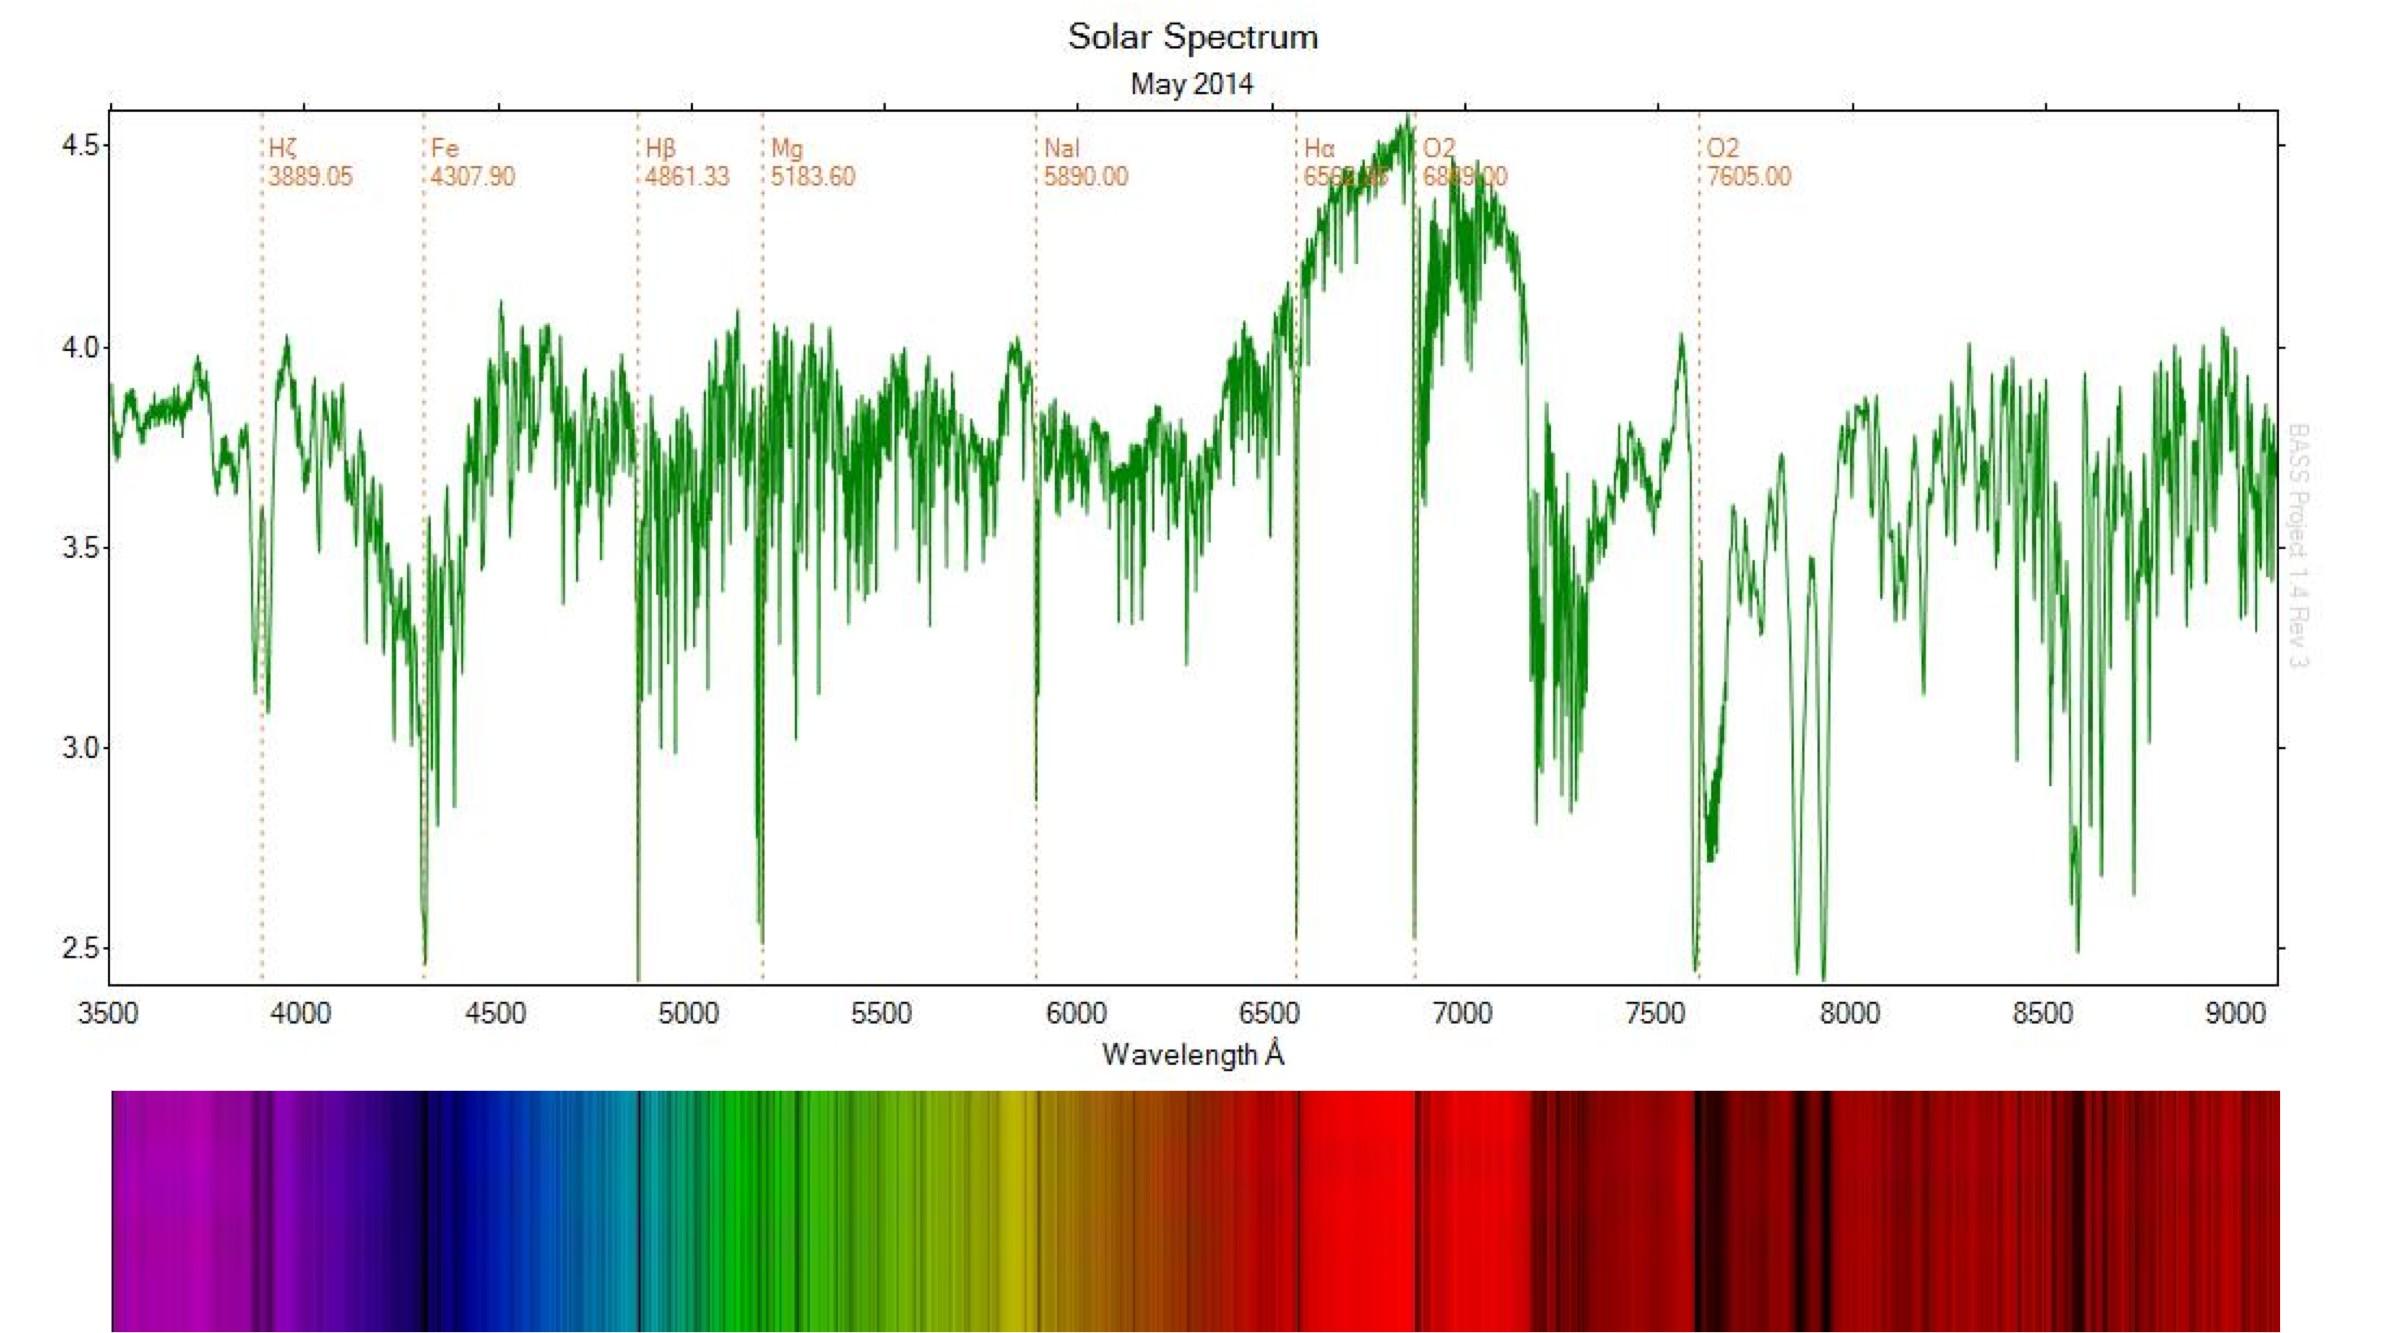 SolarSpectrumMay2014